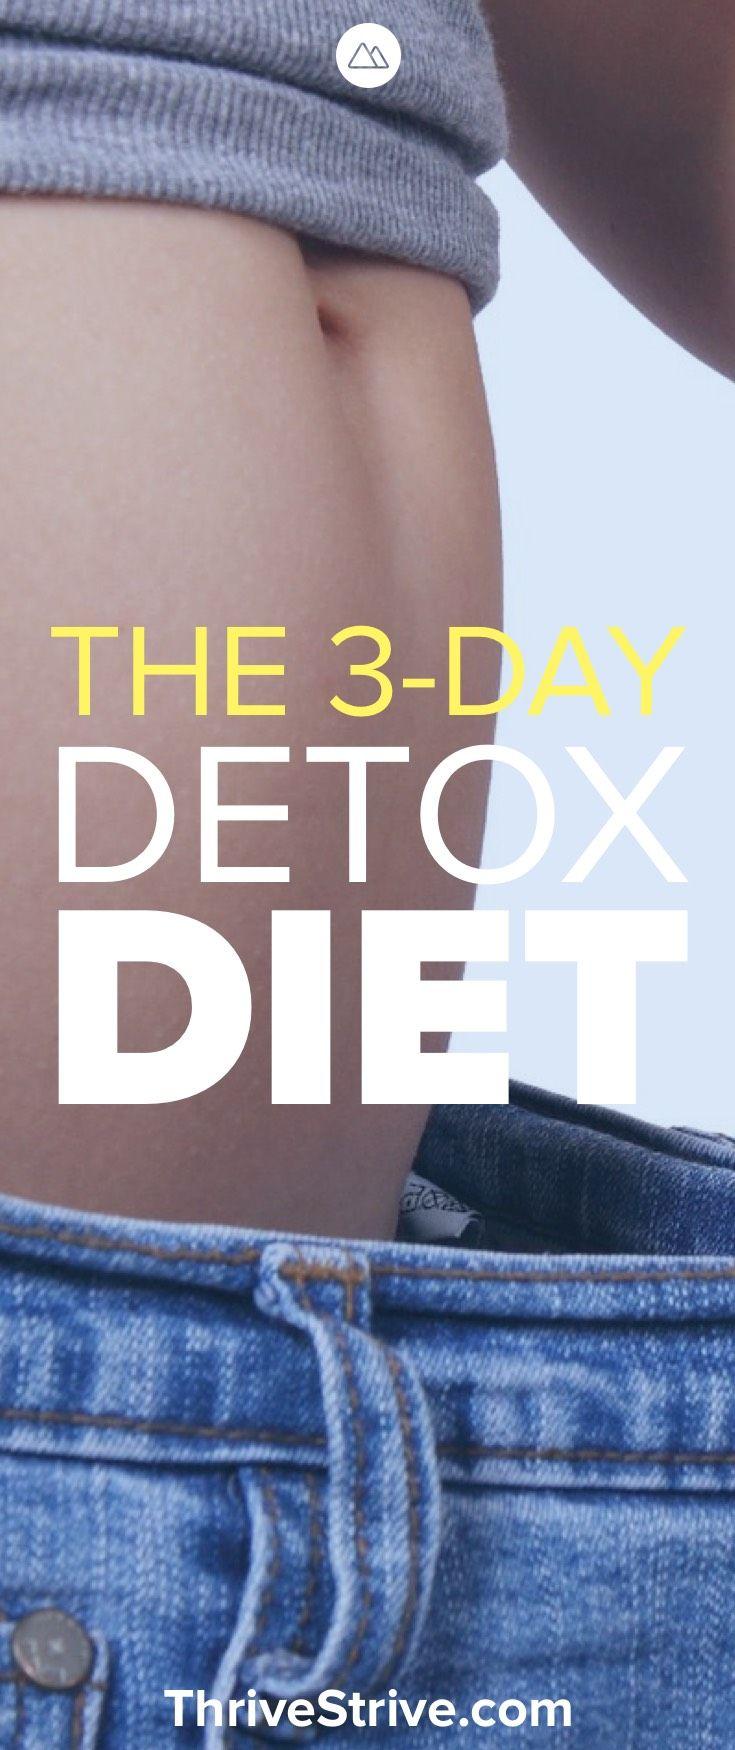 How to Do a Carb Detox: The 3-Day Detox Diet PlanRachel Roberts Tilburg